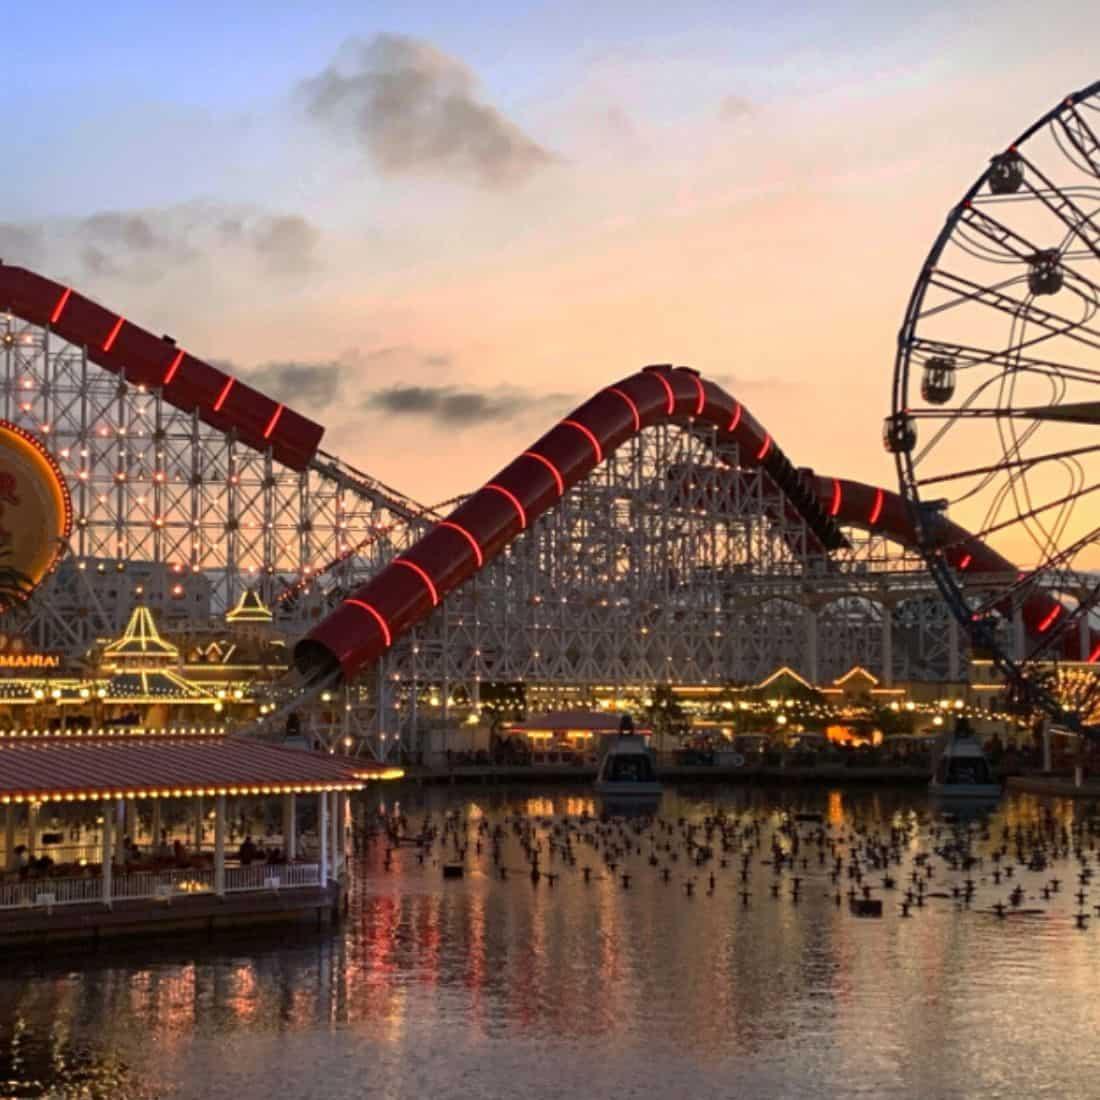 The Fastest Ride at Disneyland